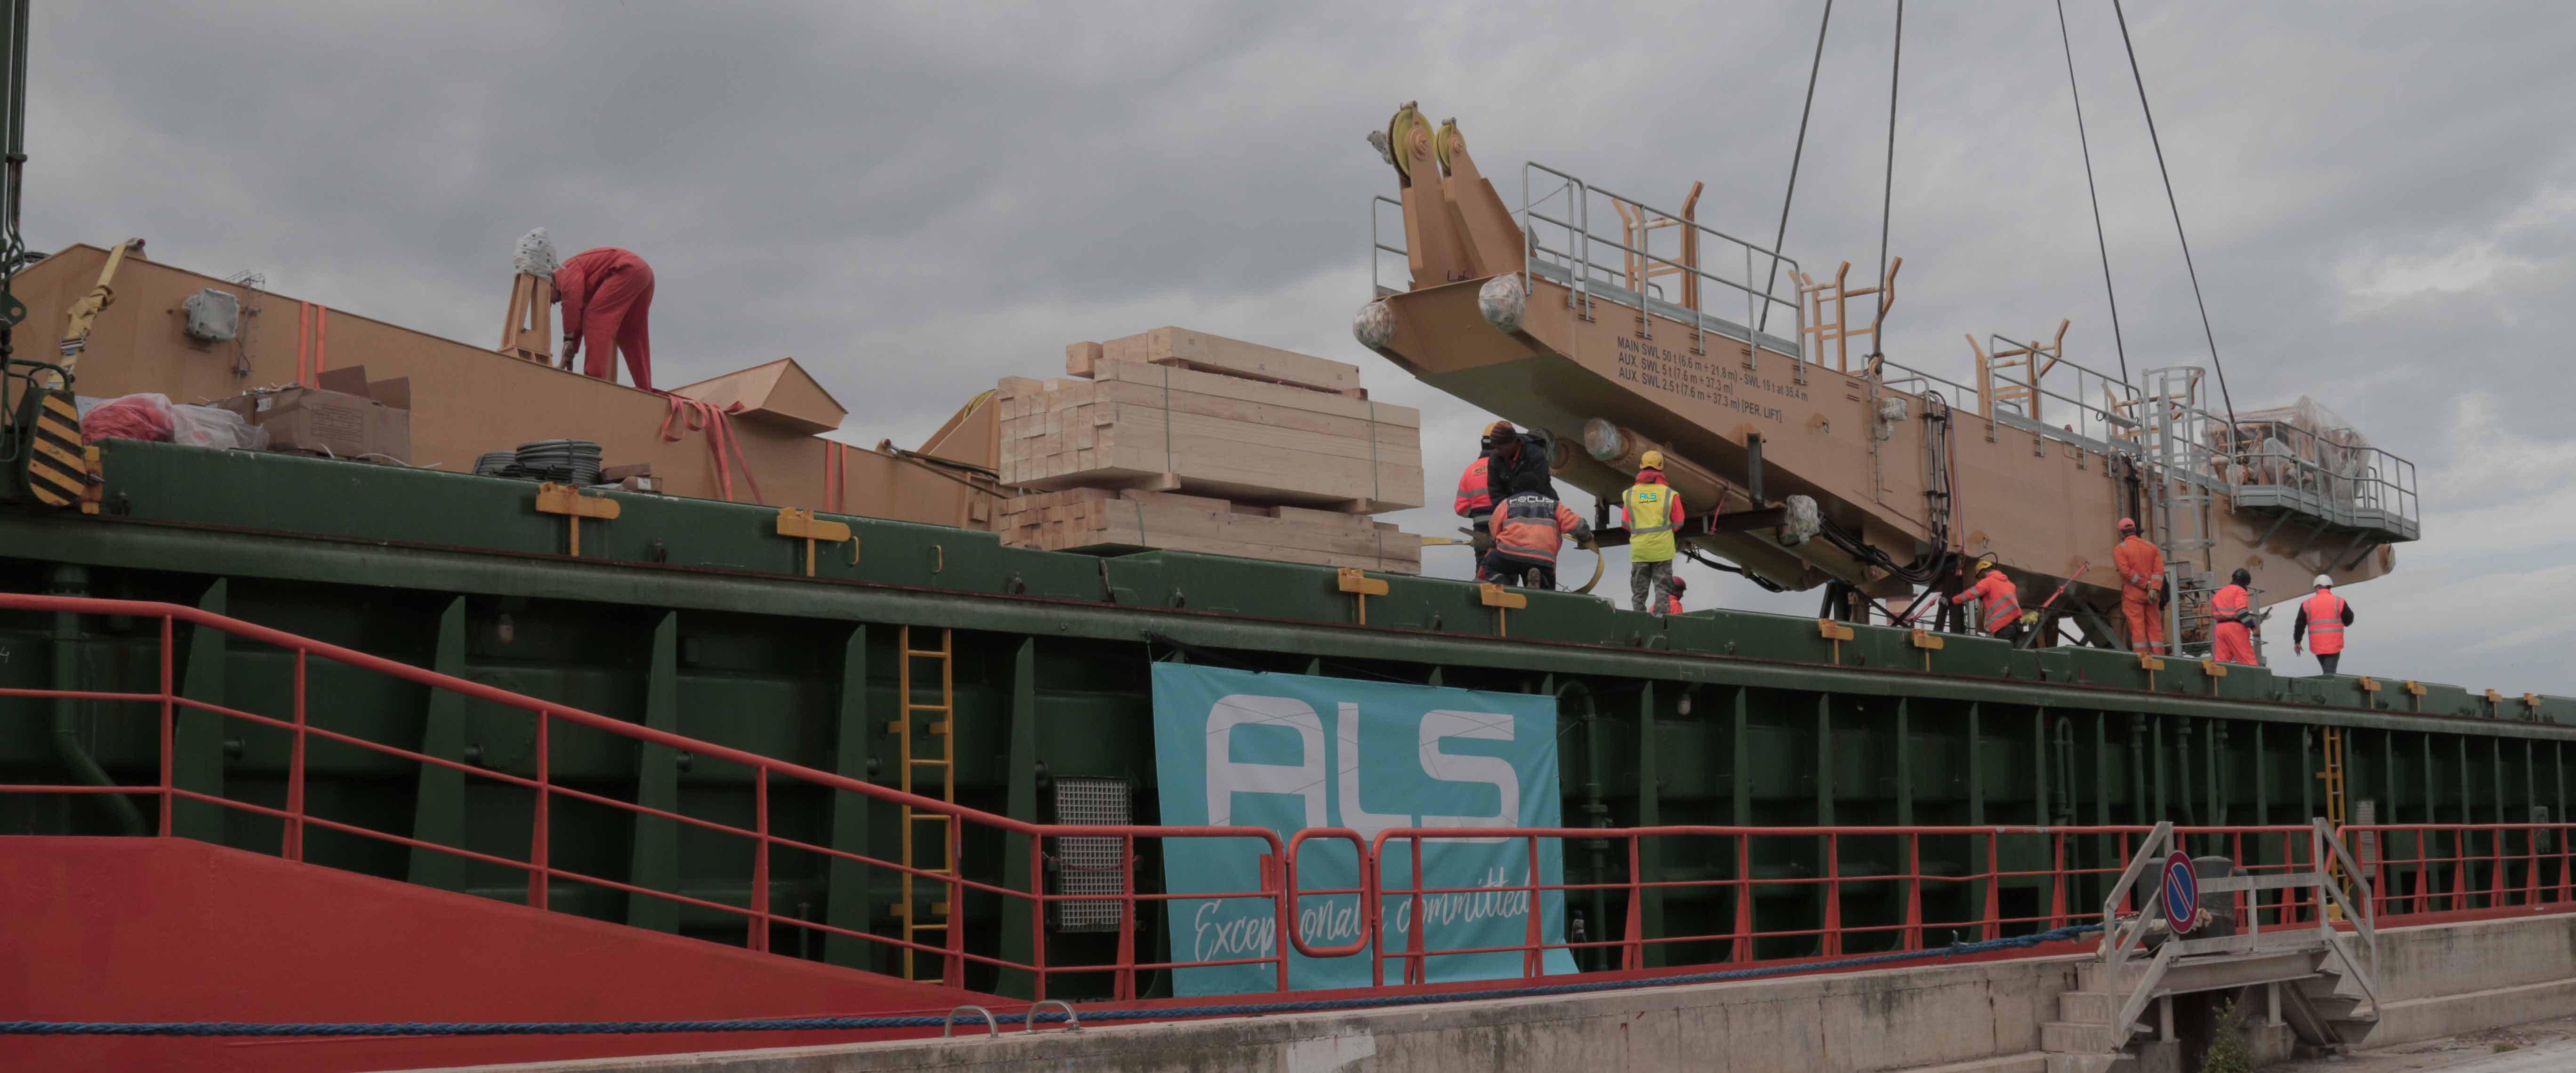 Construction & Machinery Logistics | Abnormal Loads